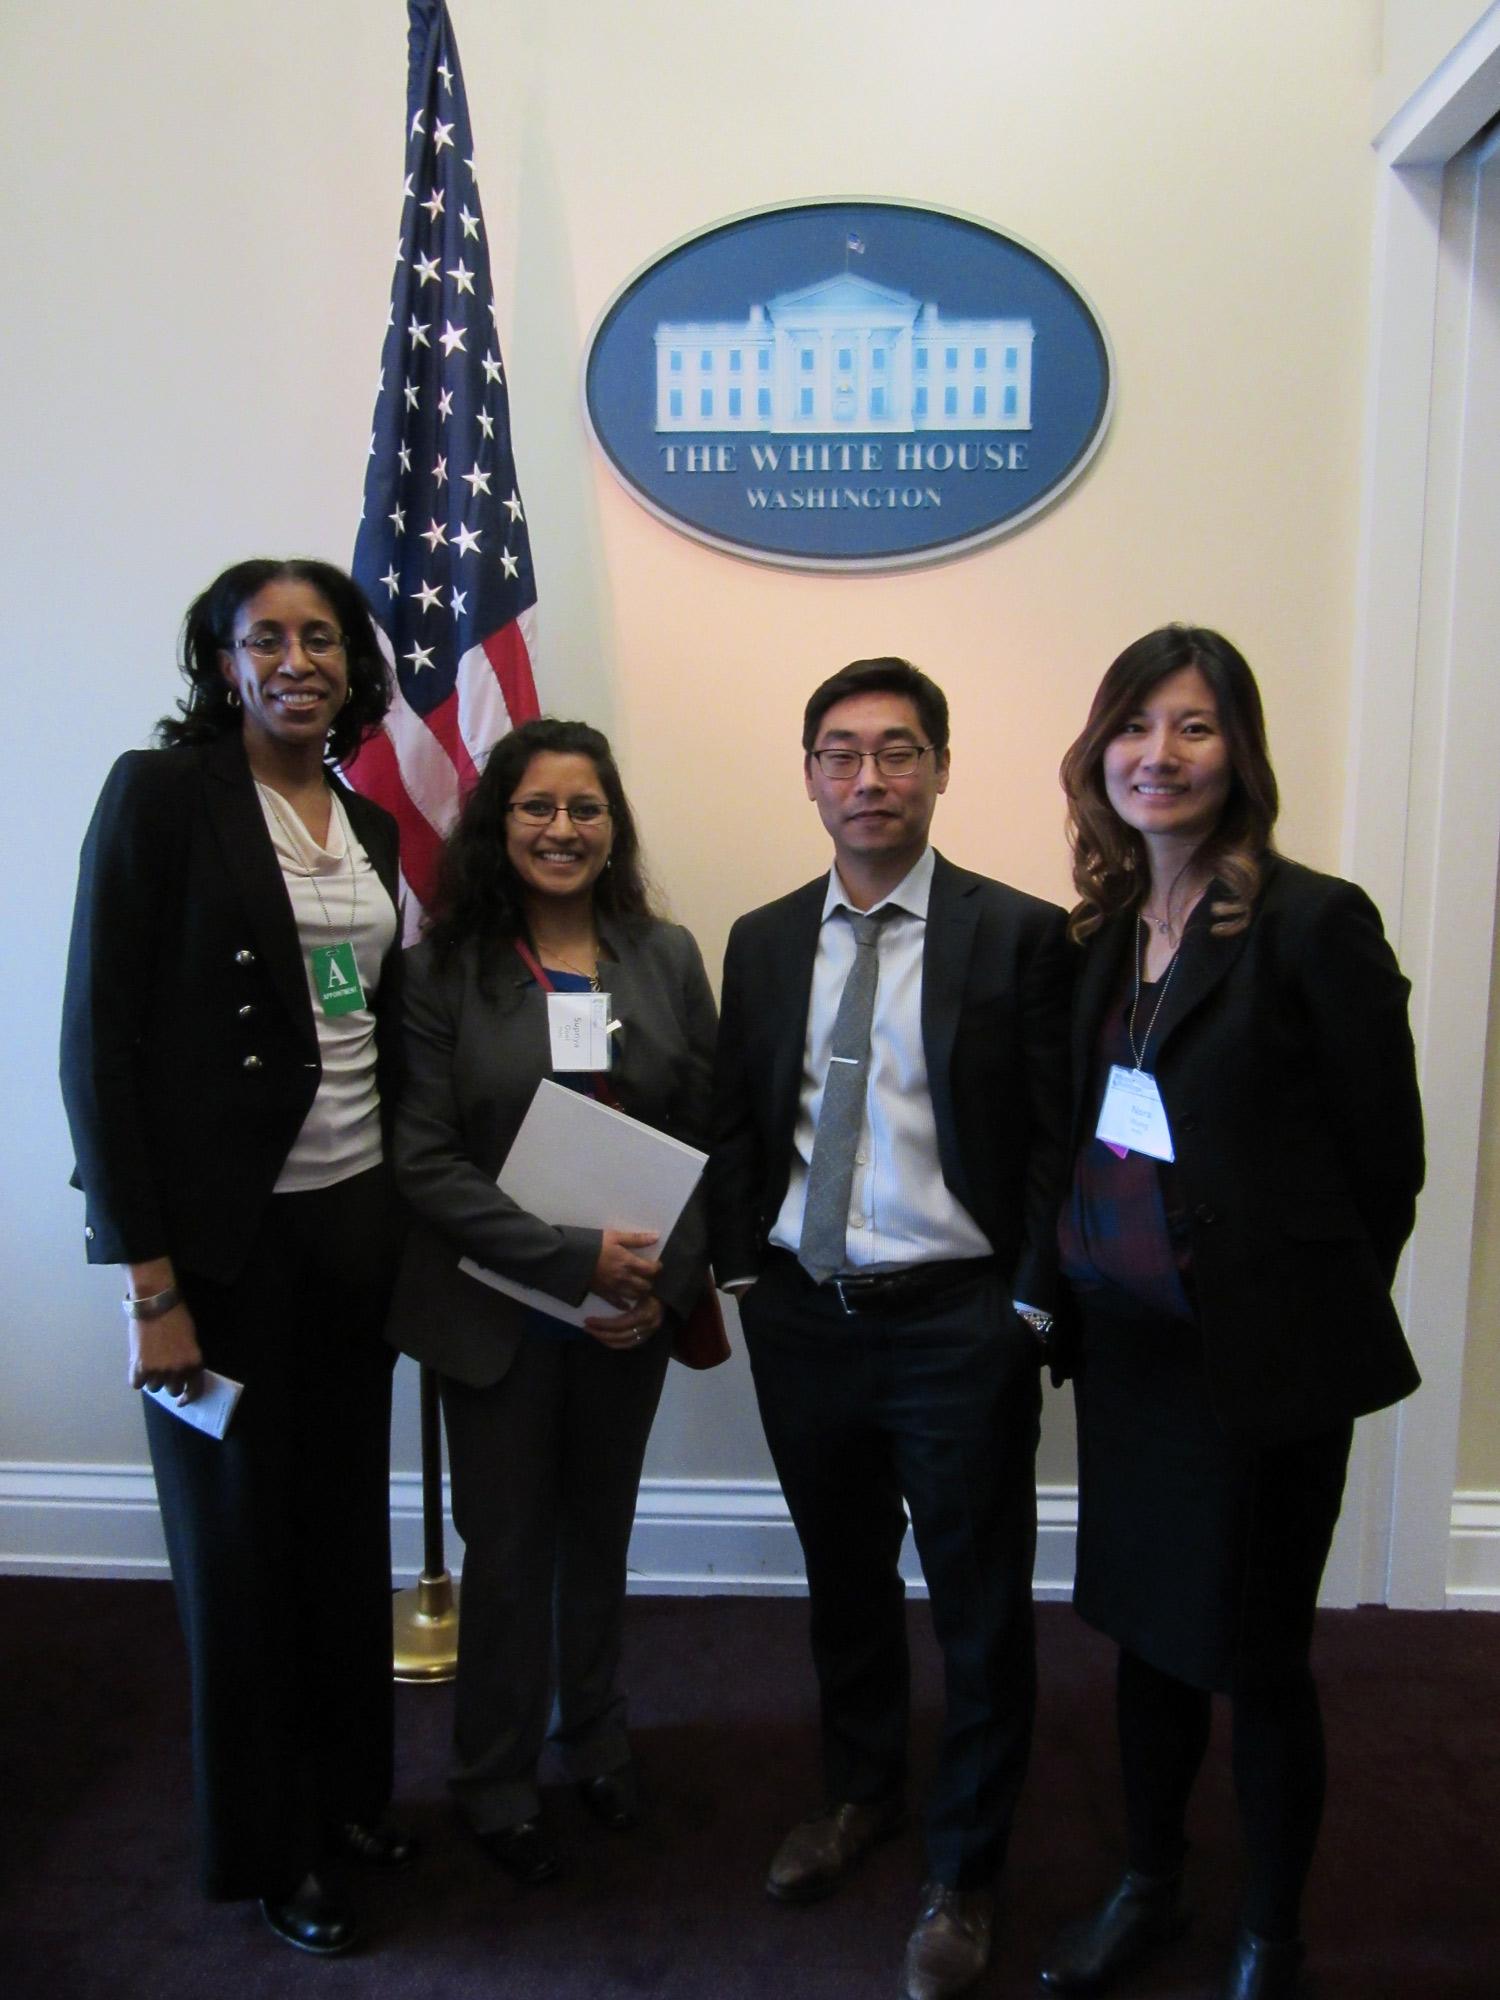 The Asset Score Tool team (L-R): Erica Cochran (SoA), Supriya Goel (PNNL), Andrew Burr (DOE), Nora Wang (PNNL)